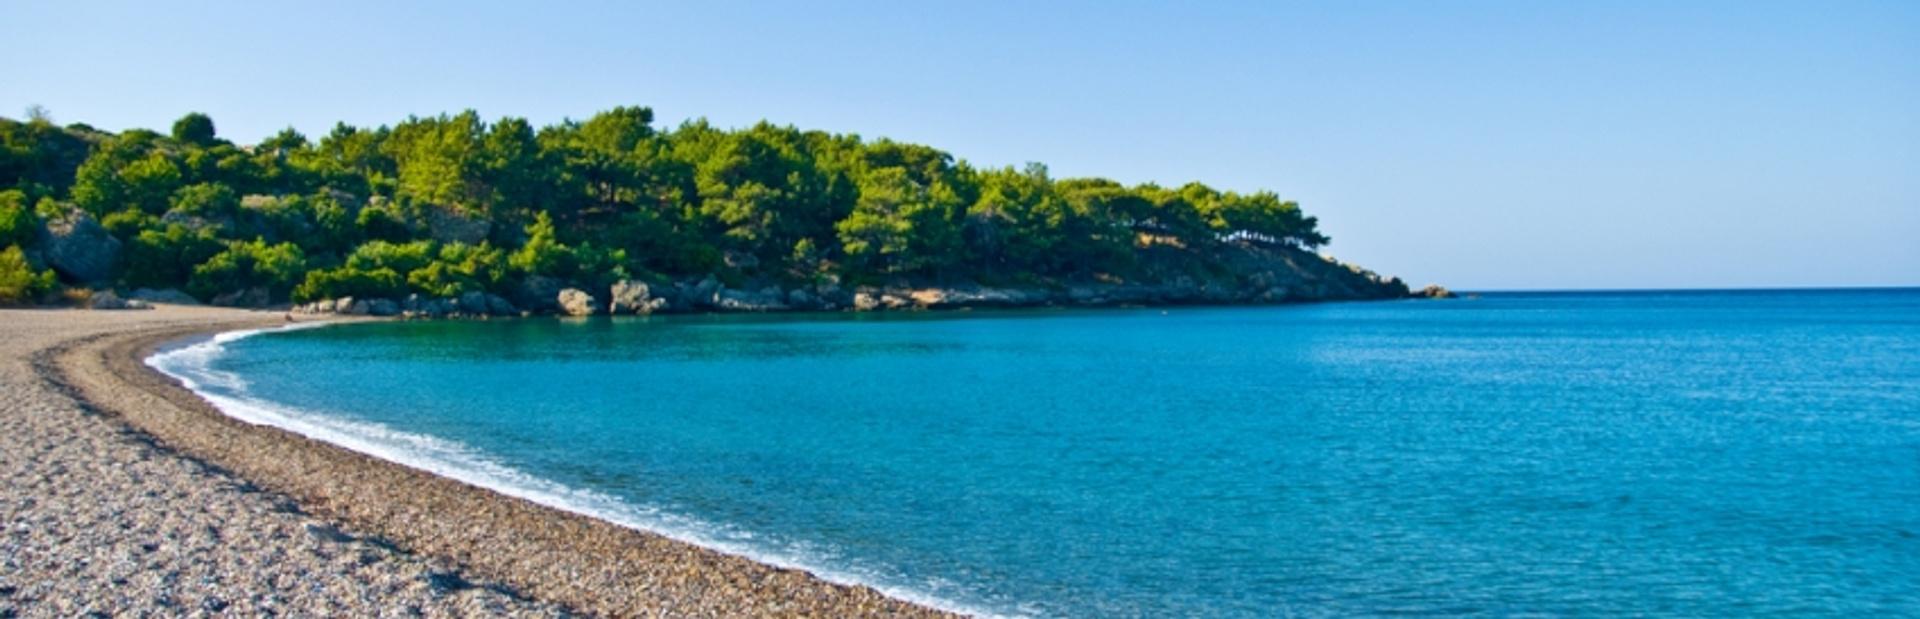 Enjoy the Bustle of Limassol